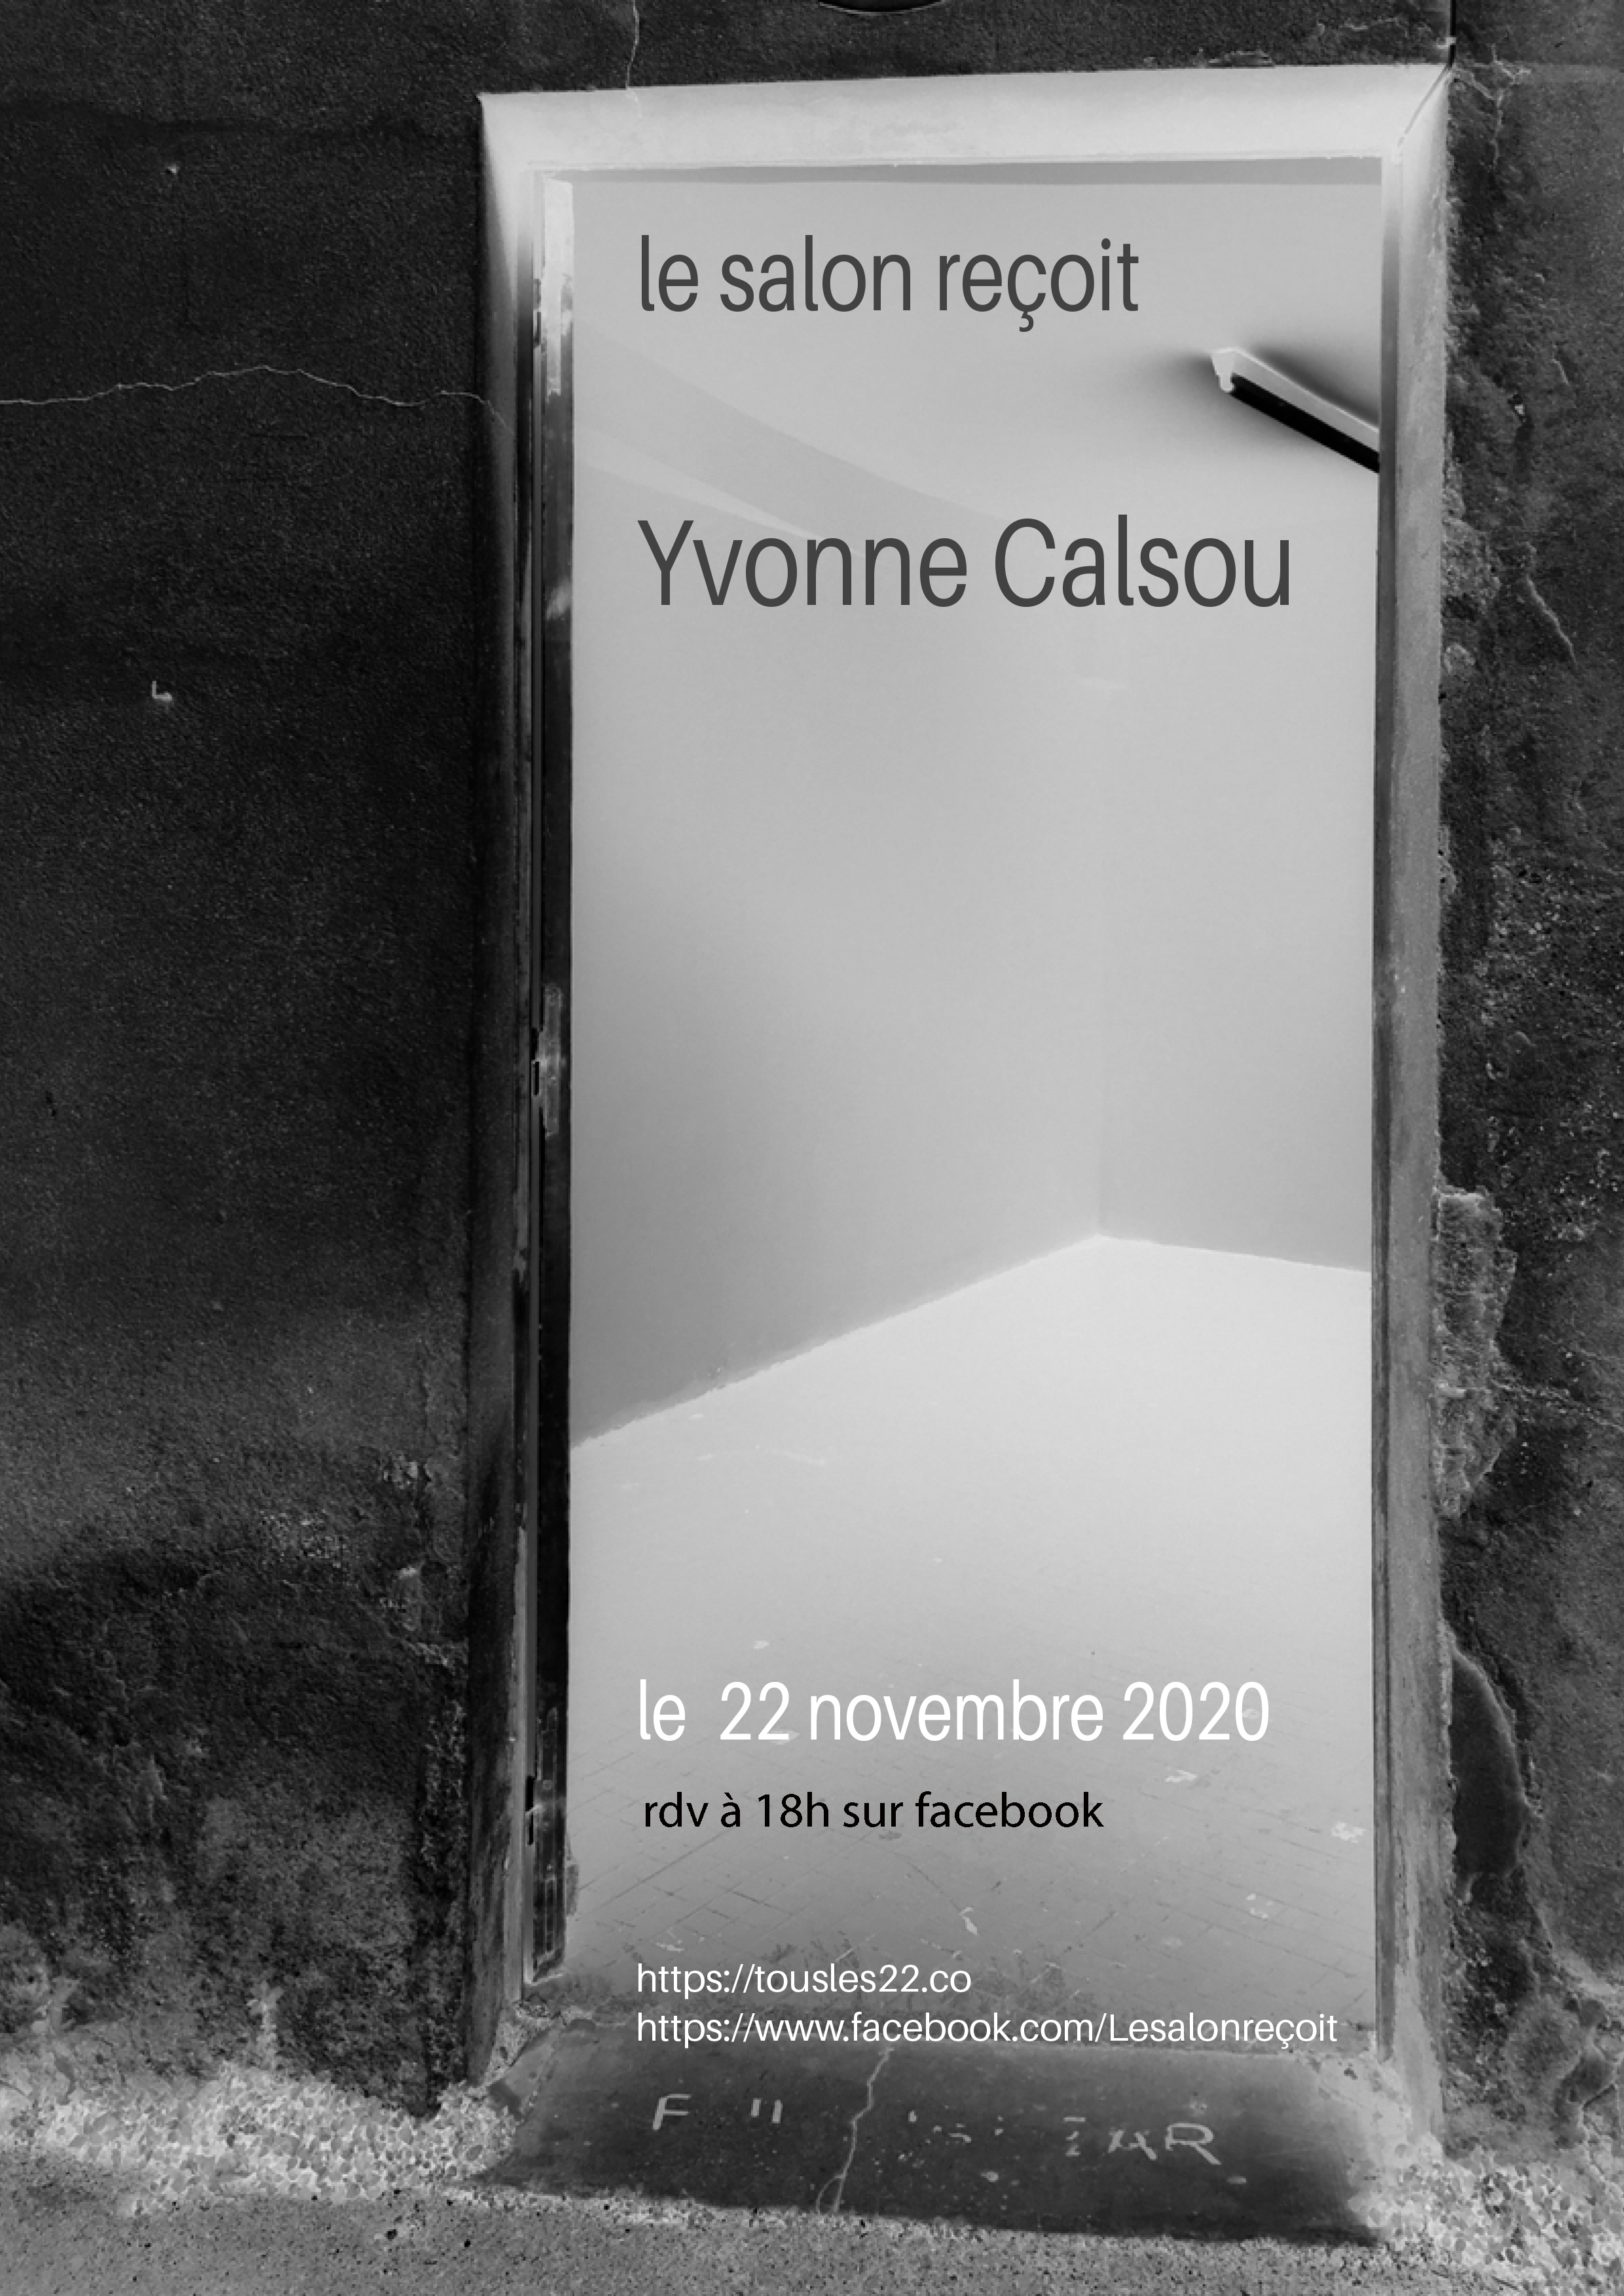 yvonne-calsou-affiche22-11-2020-2